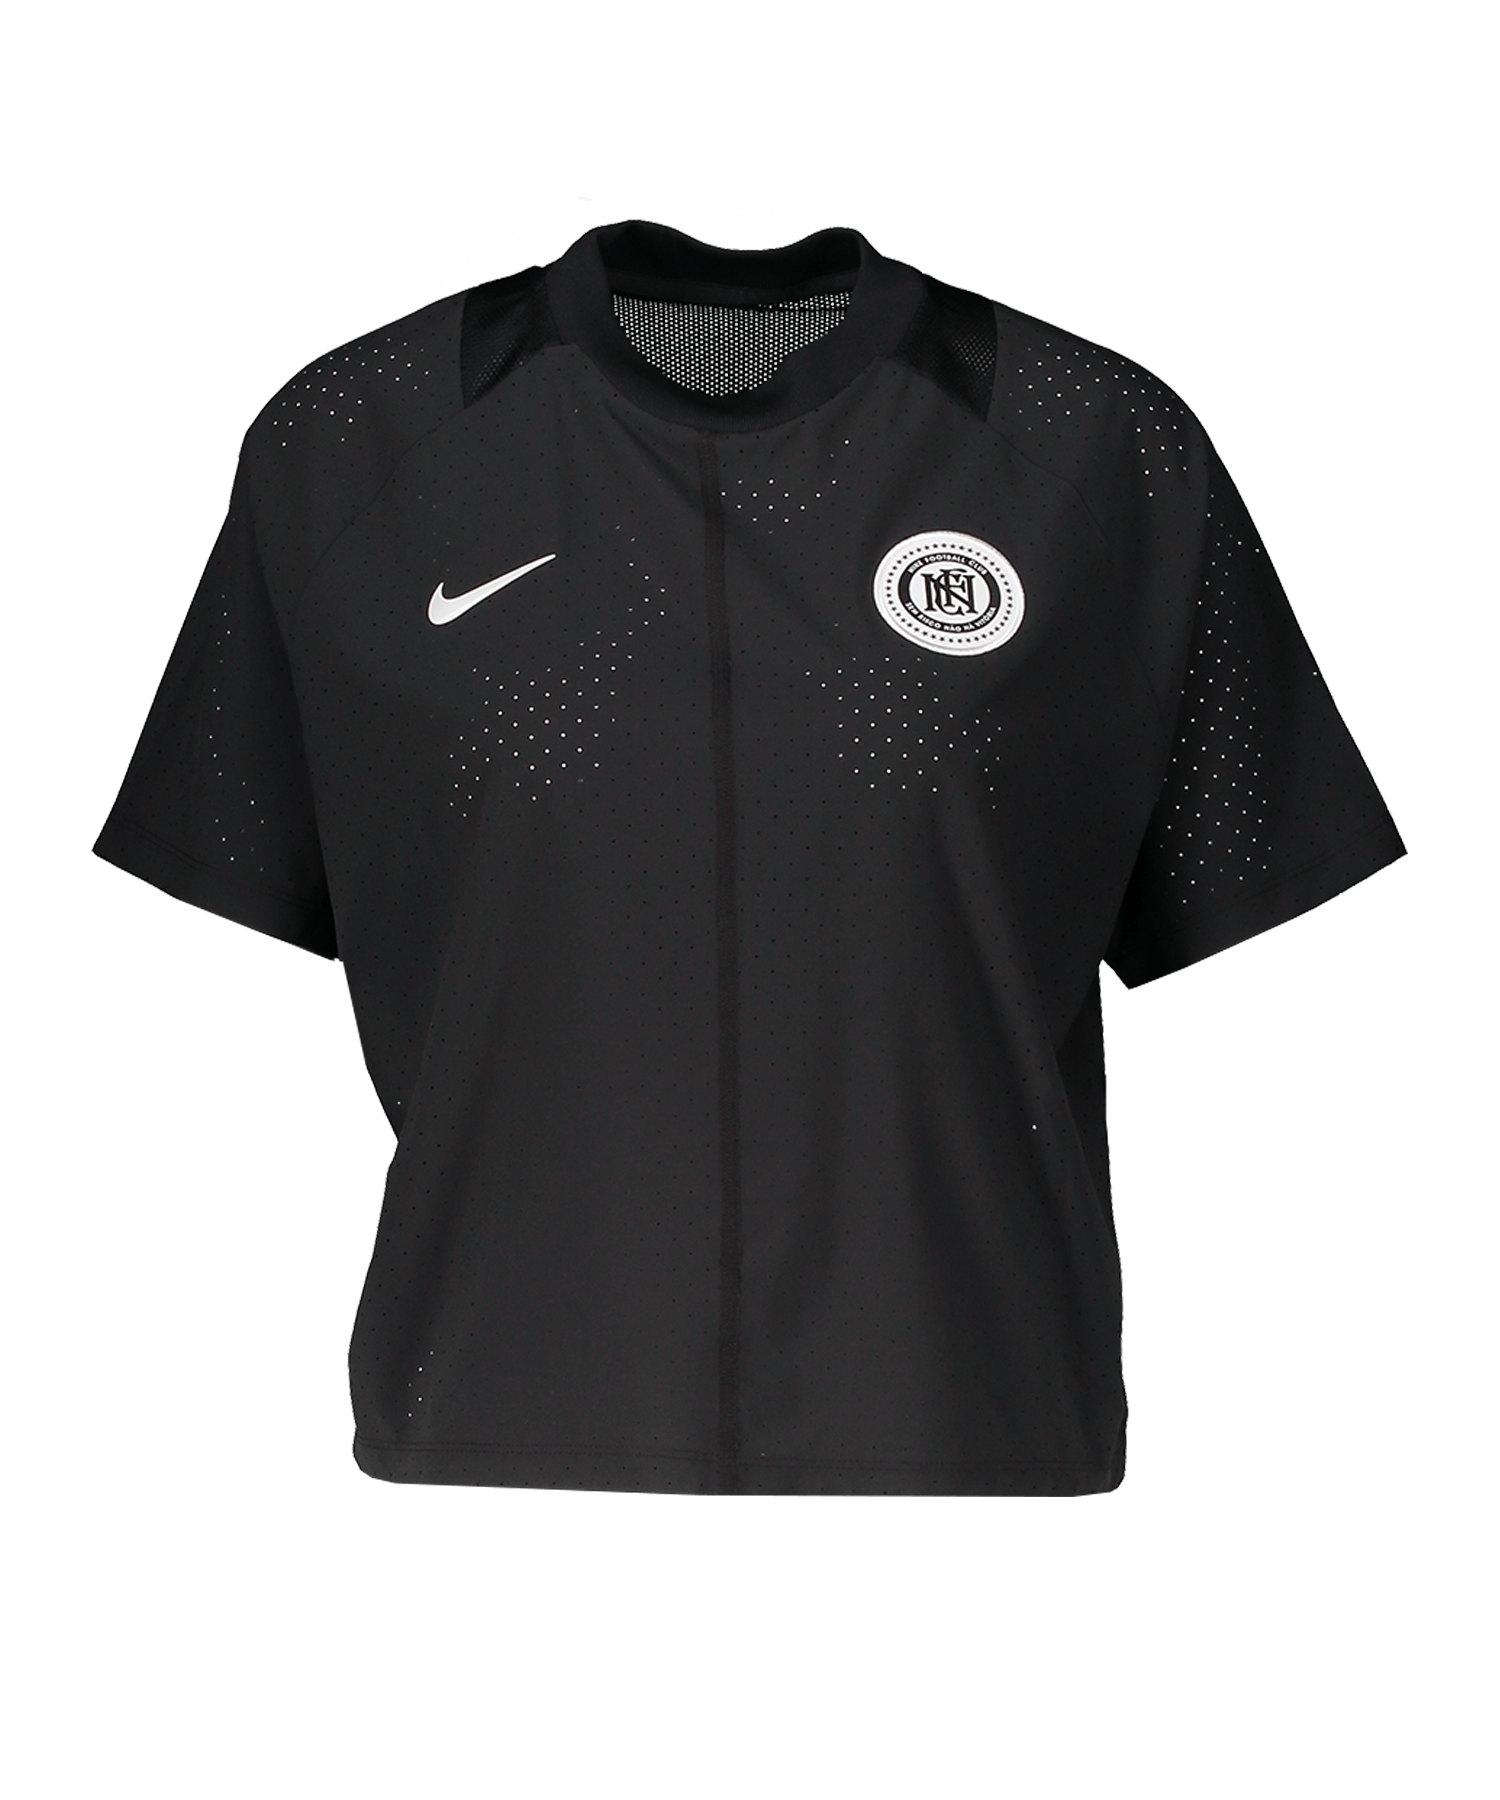 Nike F.C. T-Shirt Jersey Damen Schwarz F010 - schwarz